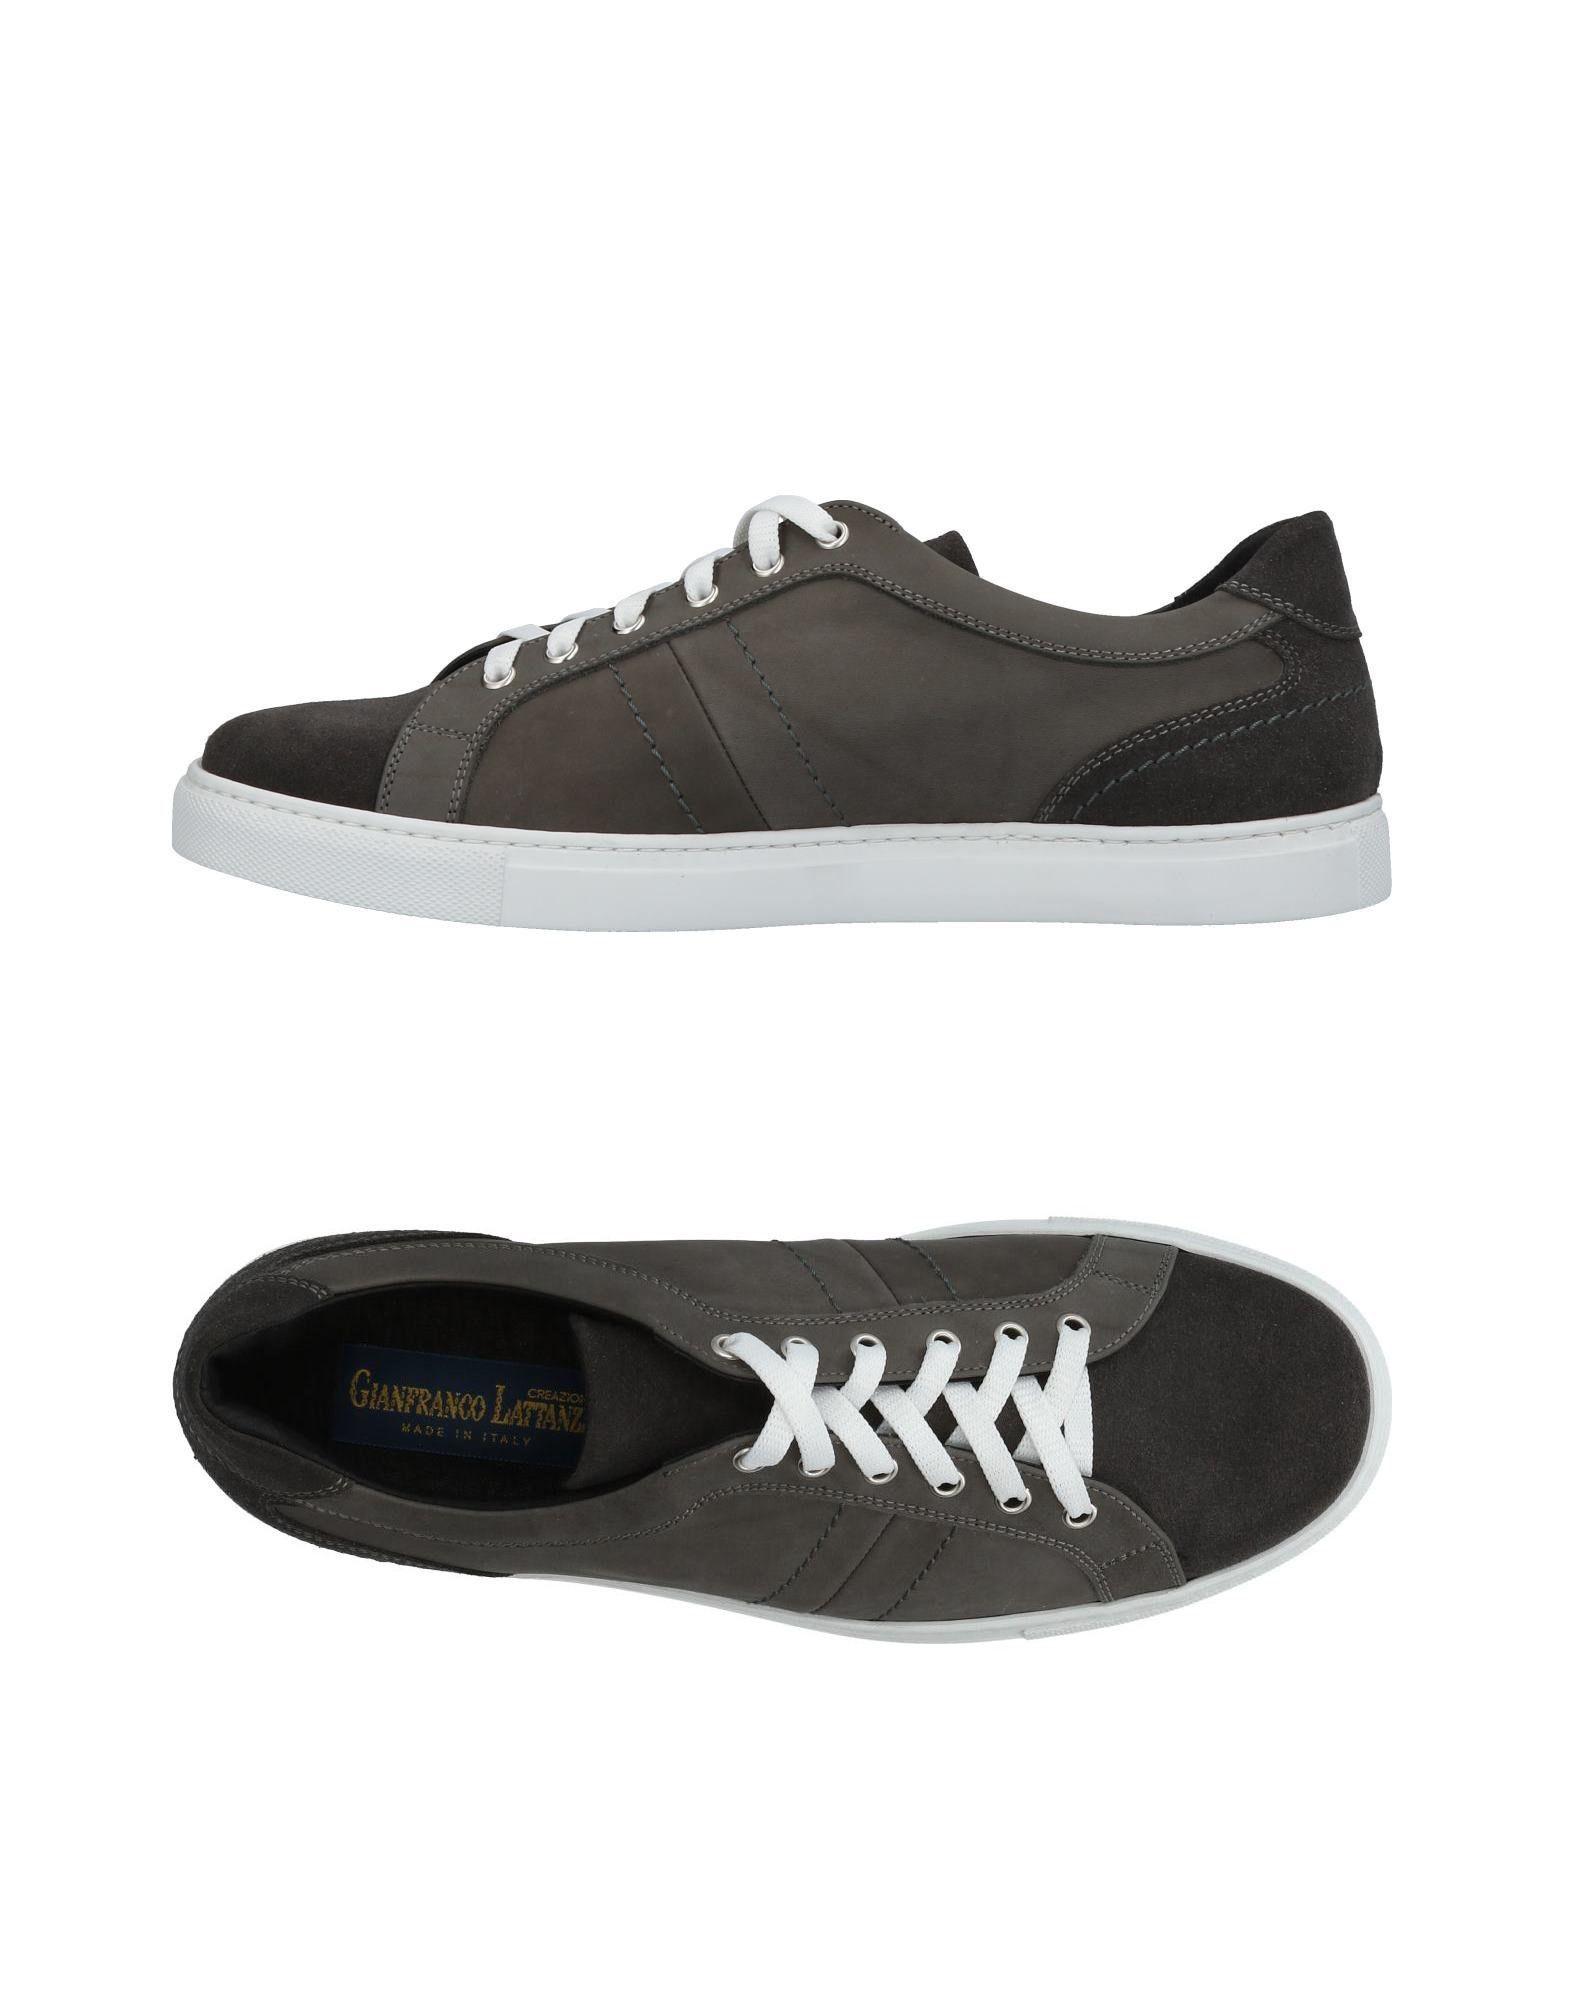 Sneakers Gianfranco Lattanzi Homme - Sneakers Gianfranco Lattanzi sur